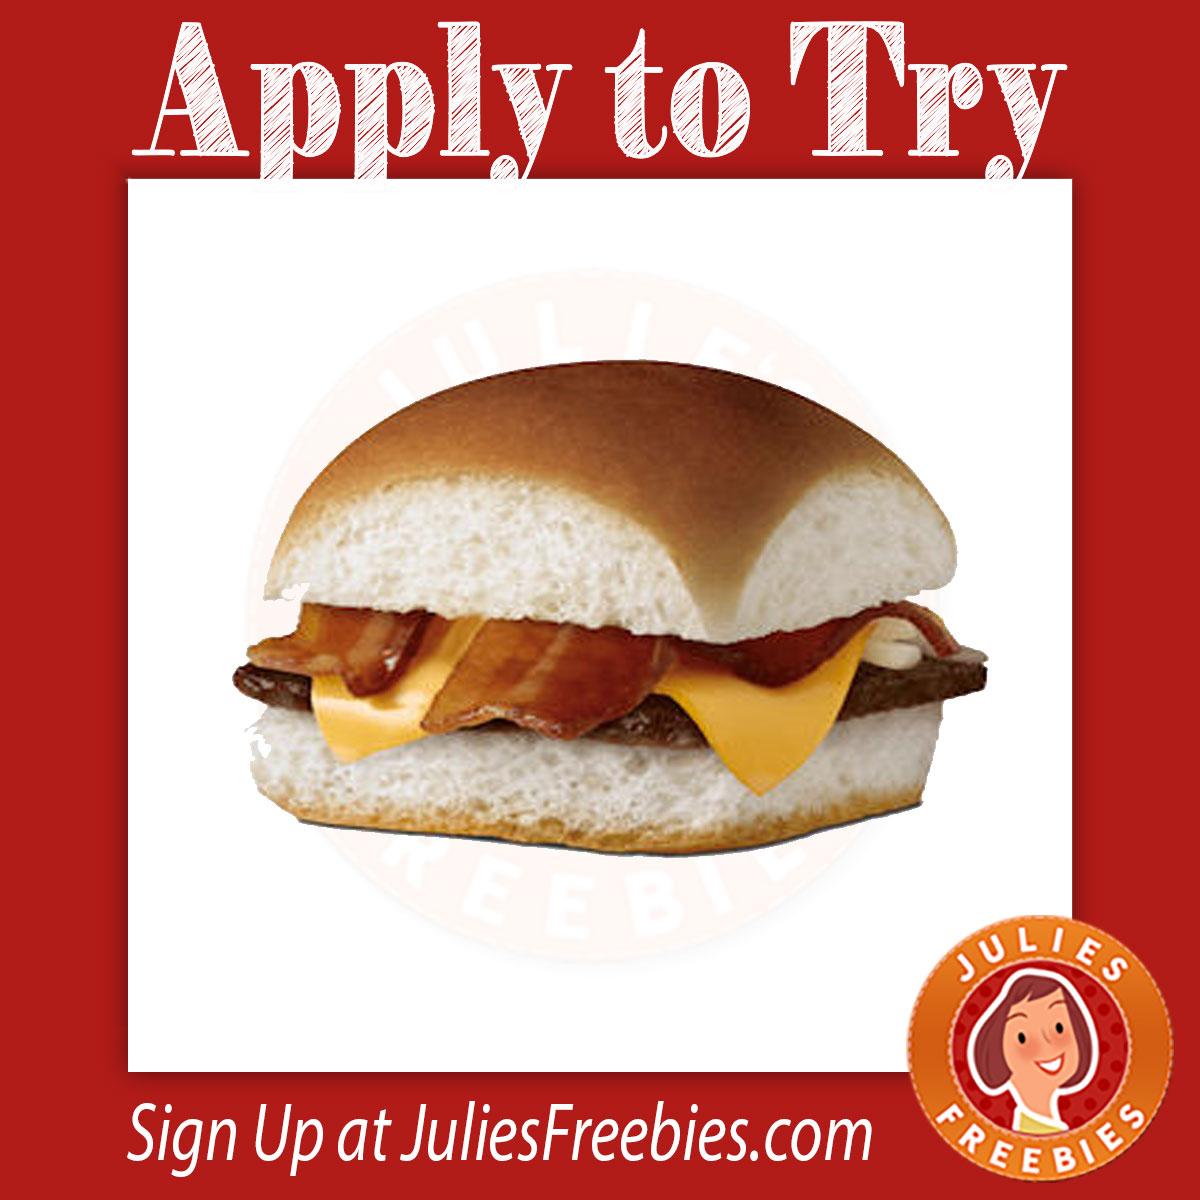 White Castle 2017: Possible Free White Castle Sandwiches